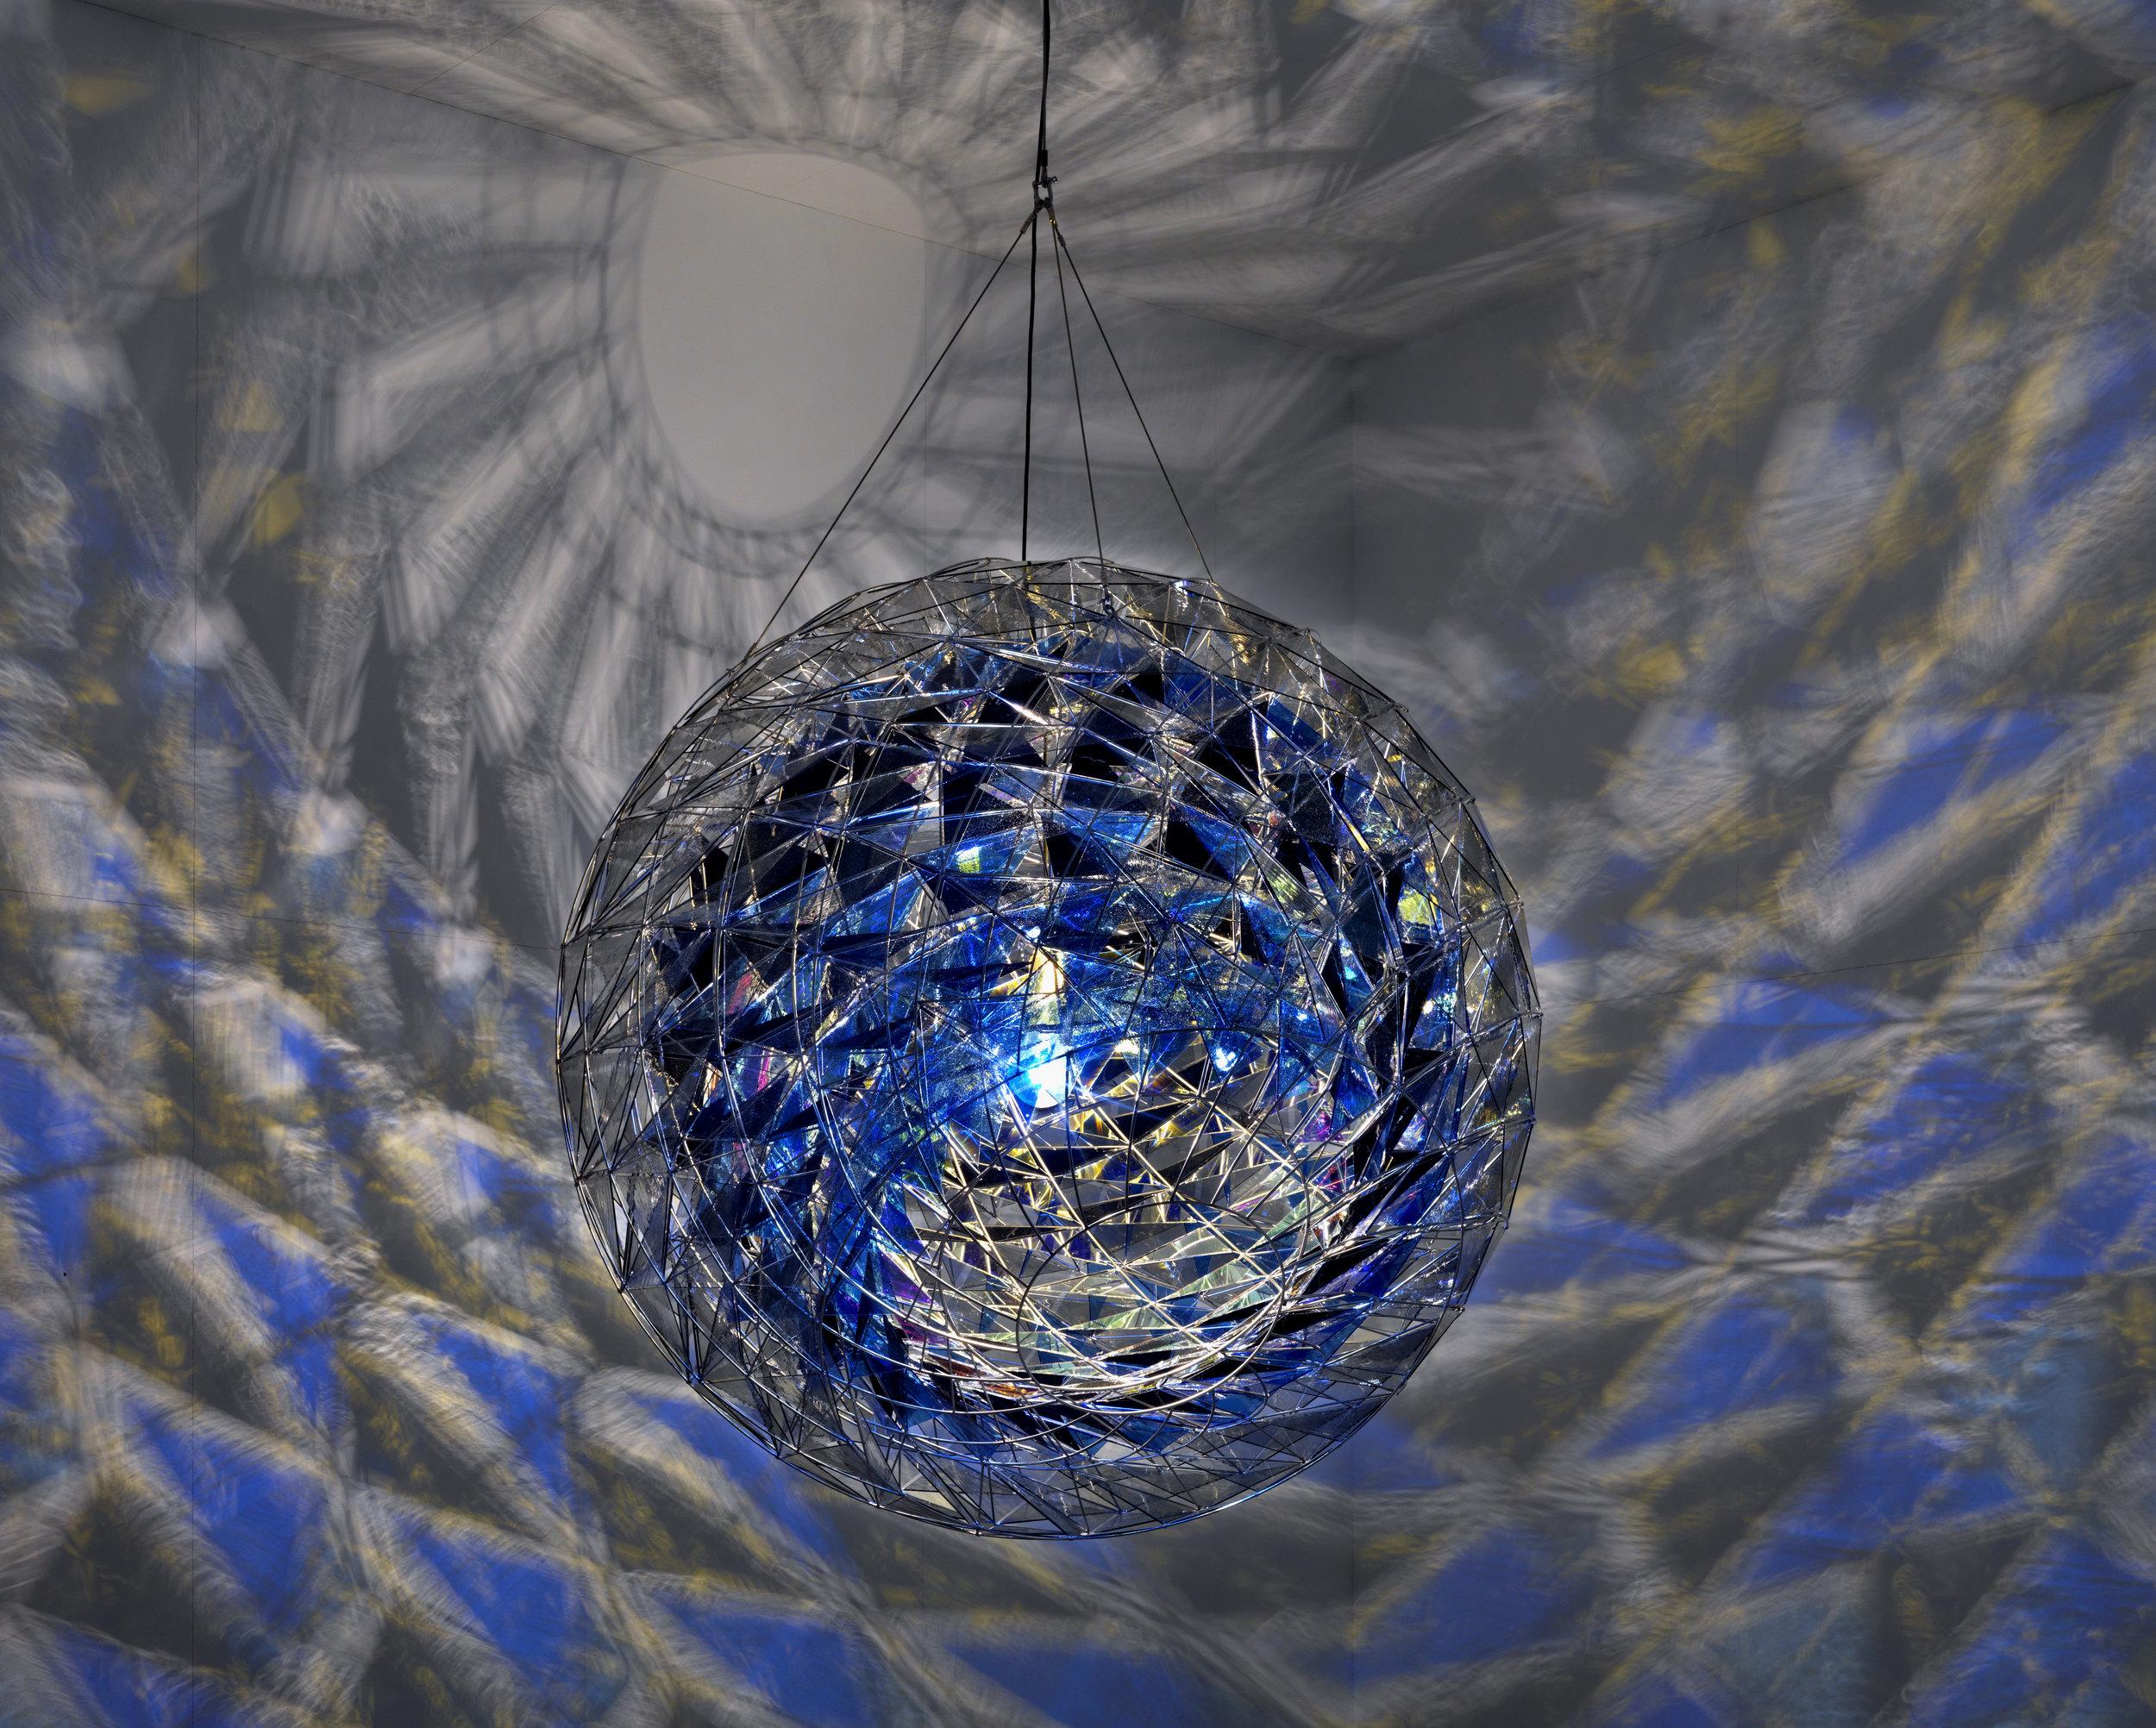 Olafur Eliasson (b.1967)   Cold wind sphere  2012 Stainless steel, coloured glass (dark blue, blue and light grey), mirror,colour-effect filter glass (blue),bulb ø 1700 mm Photo: Jens Ziehe Centre Pompidou, Paris © 2012 Olafur Eliasson